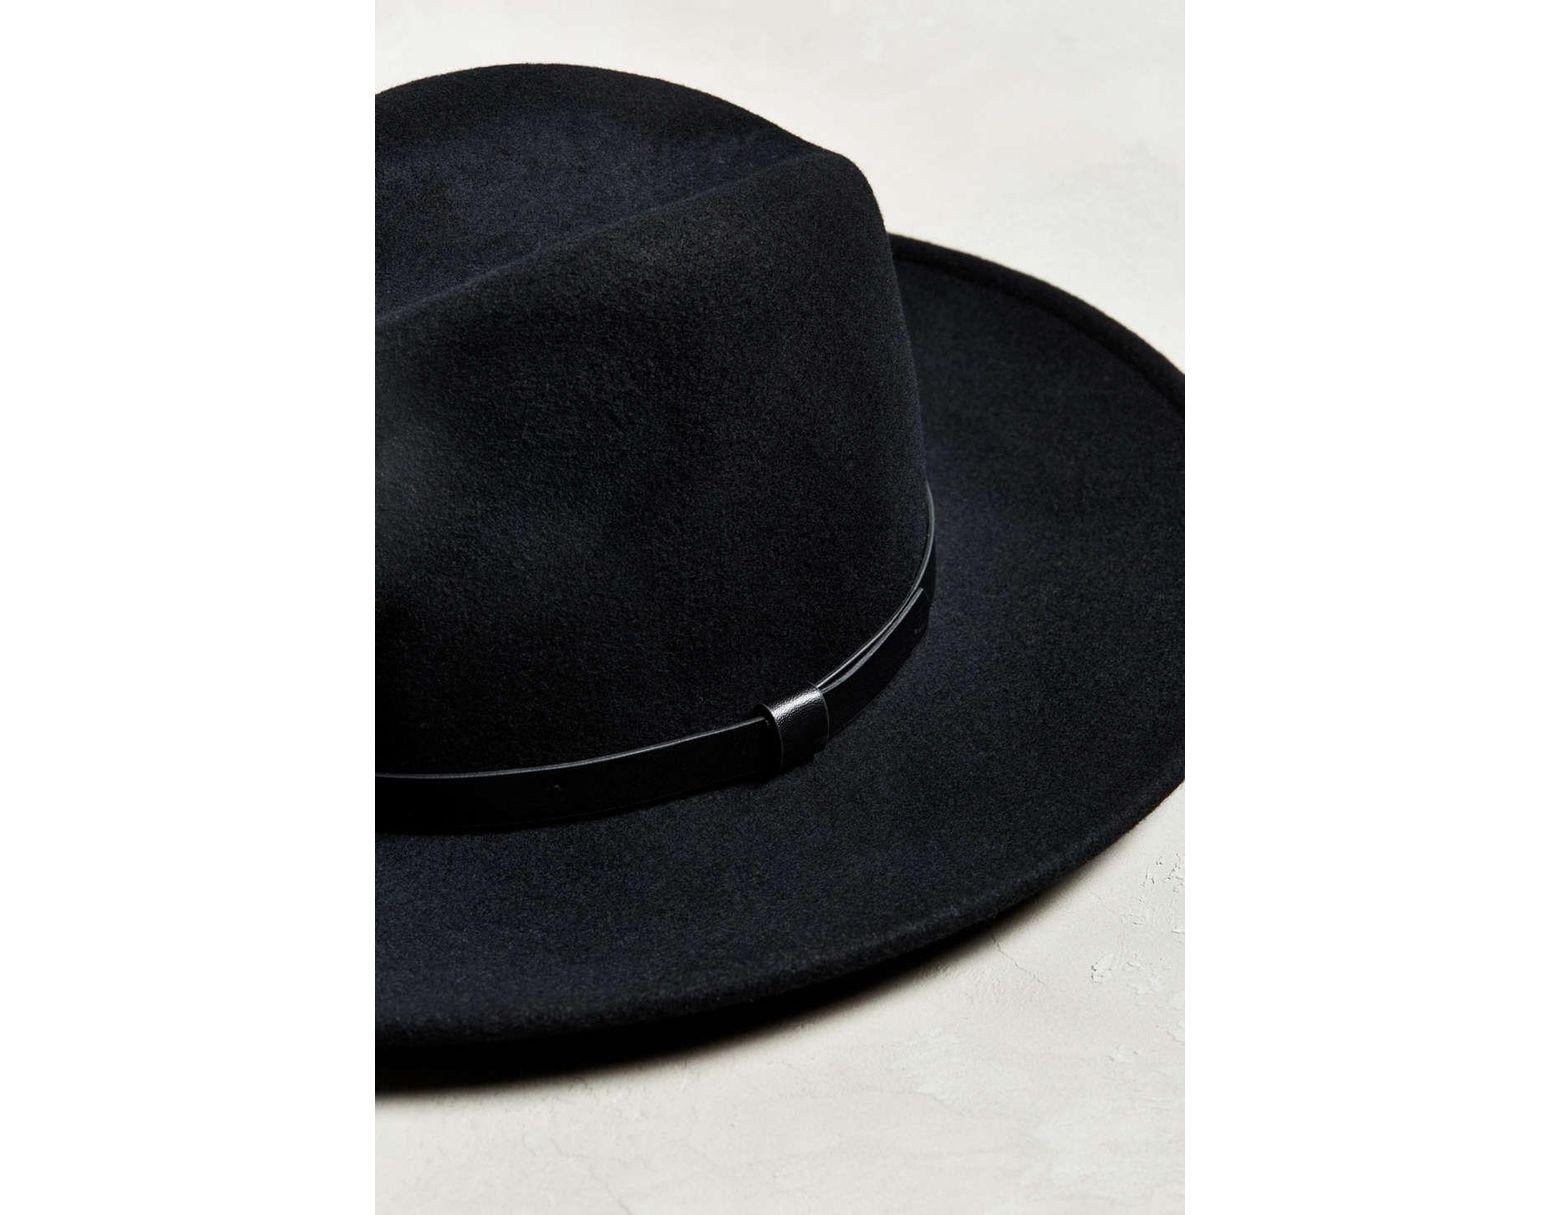 1c0fc02ae35a4 Lyst - Urban Outfitters Wide Brim Fedora in Black